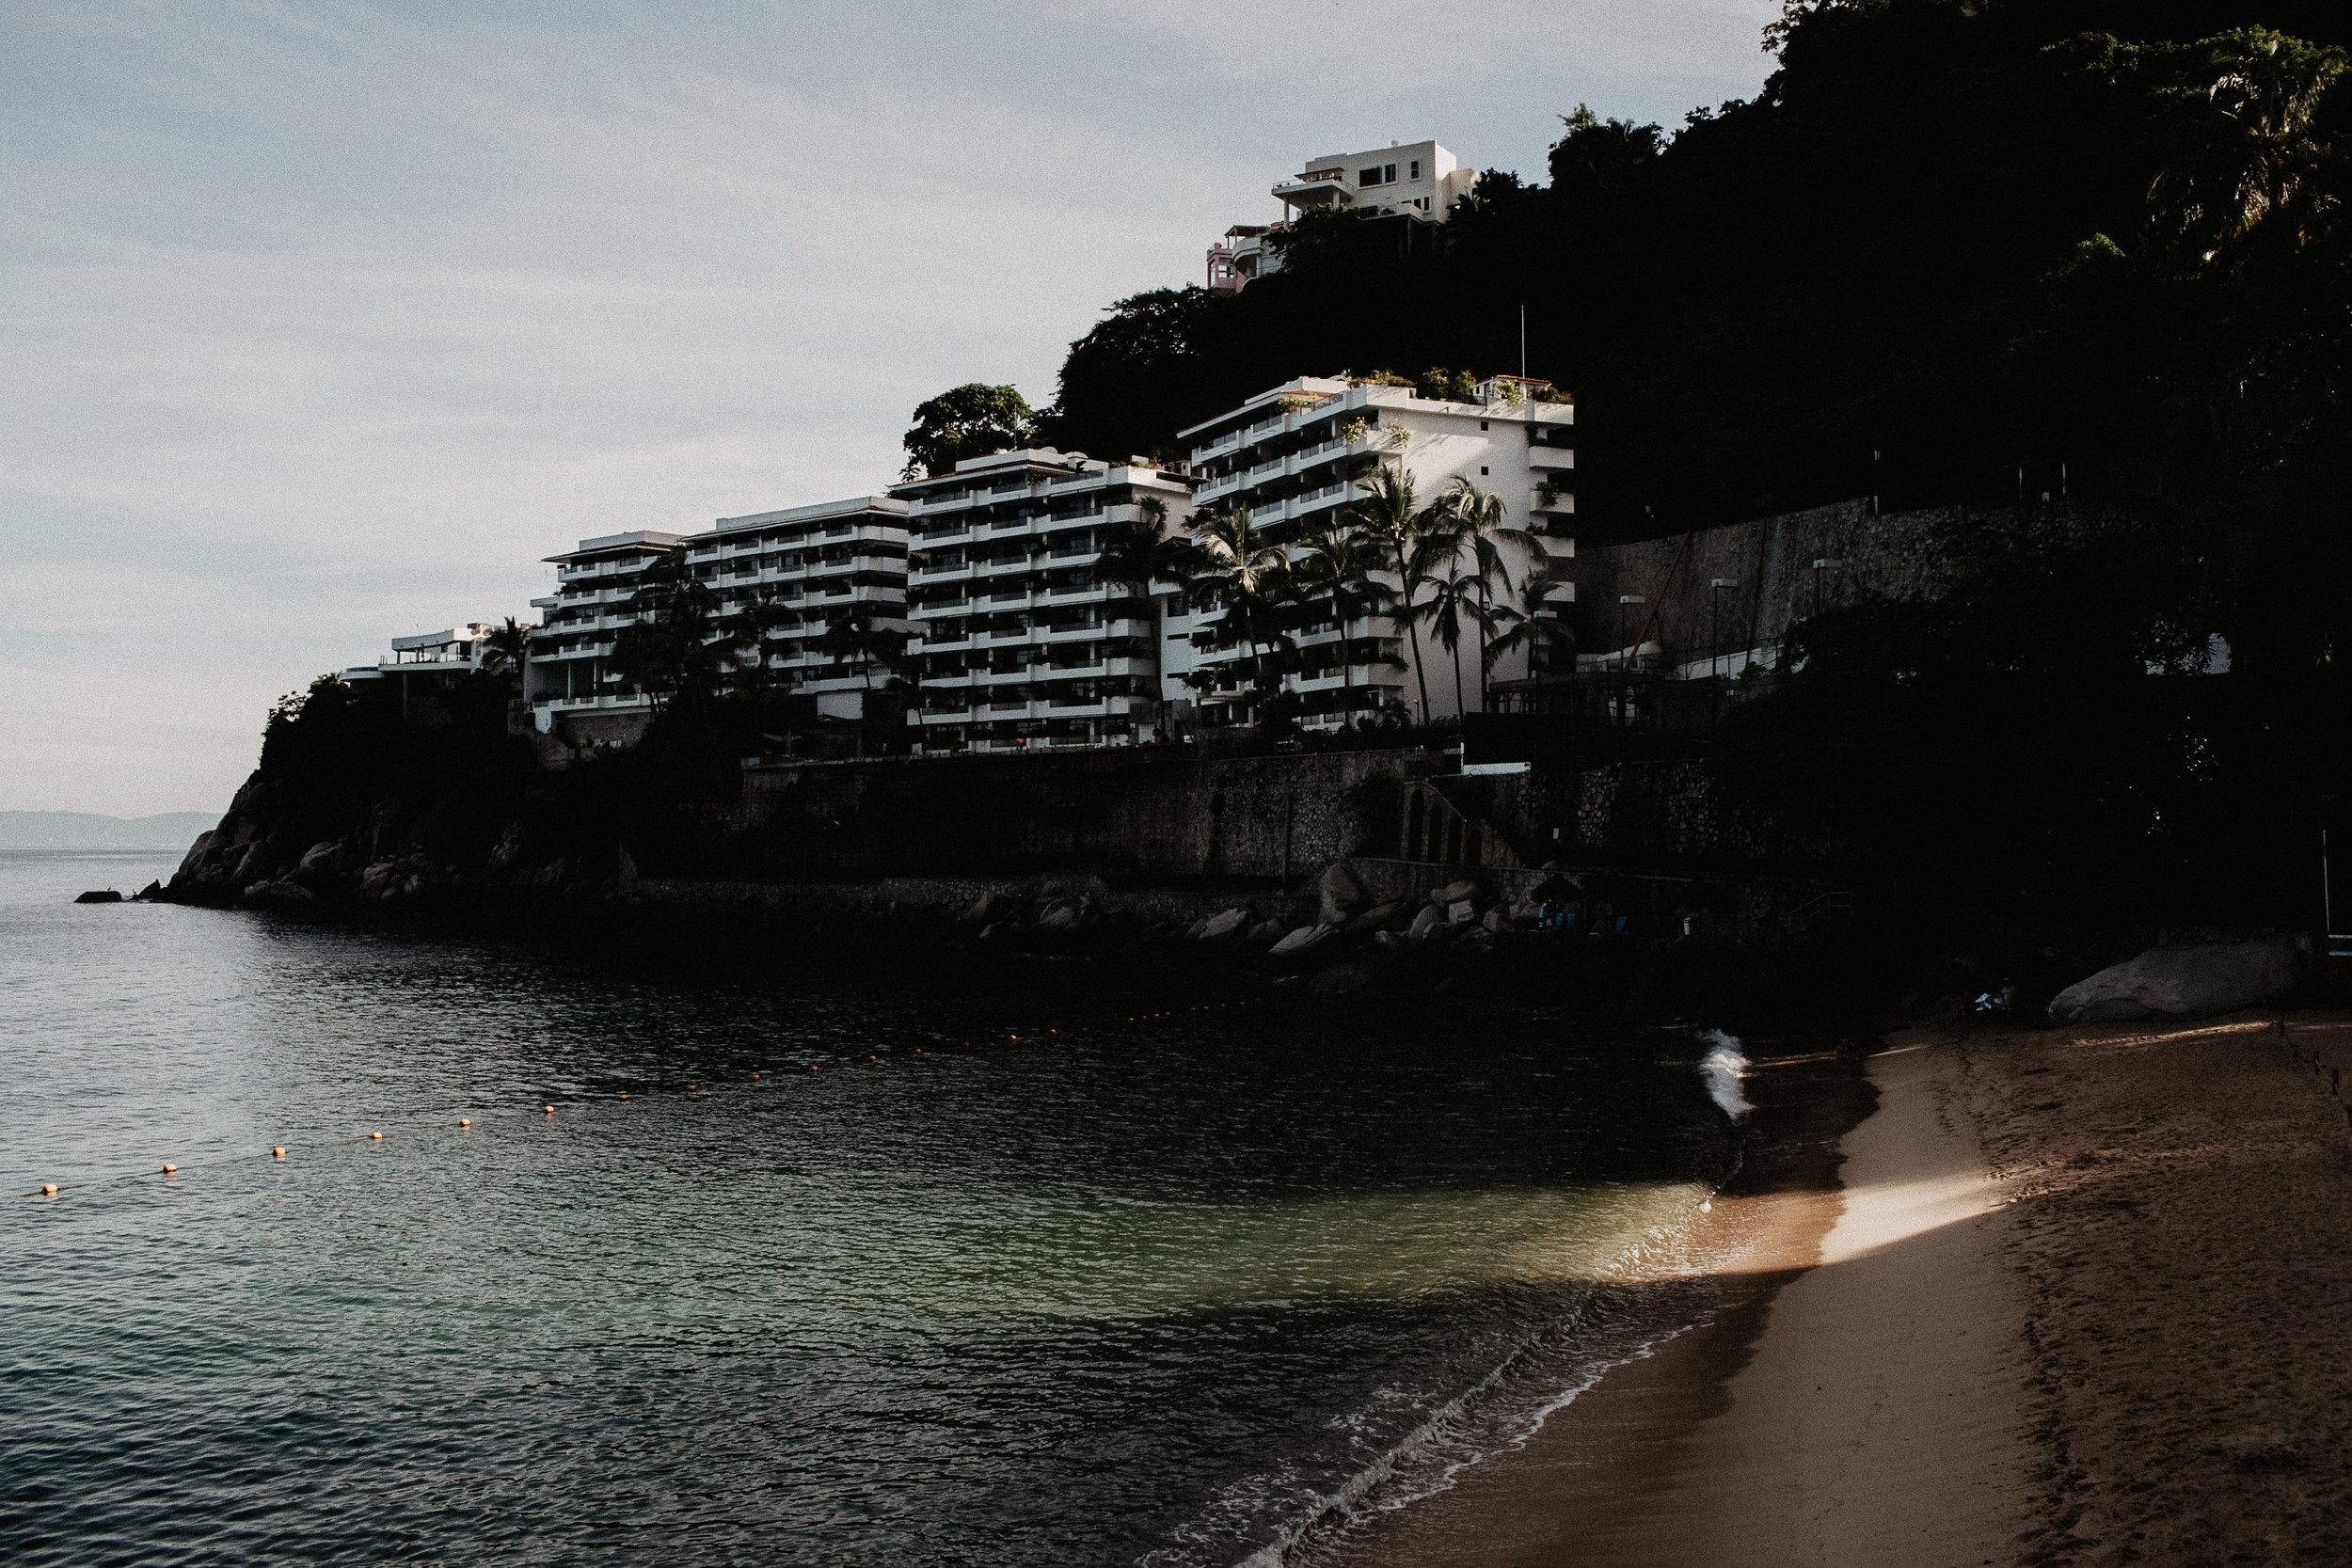 alfonso_flores_destination_wedding_photography_puerto_vallarta_hotel_barcelo_vallarta_cuttler_amela-36.JPG